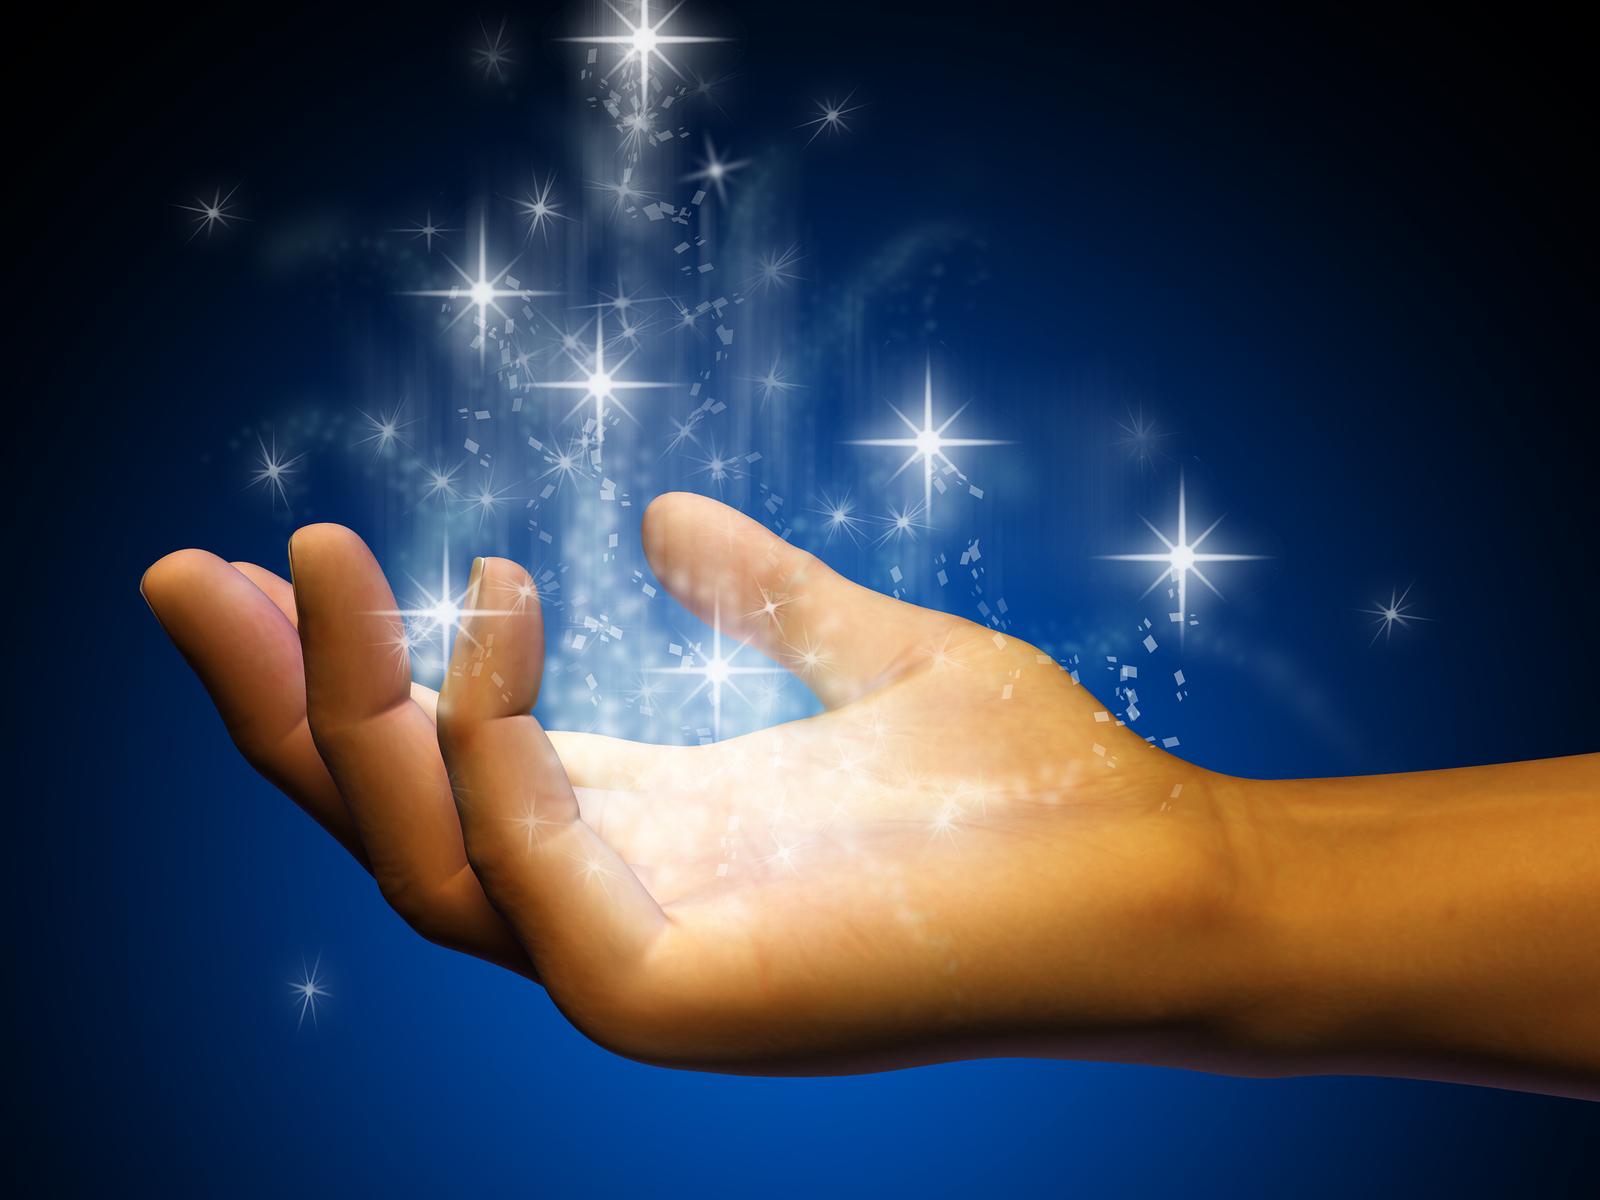 psychic-mediums-online-psychic-readings